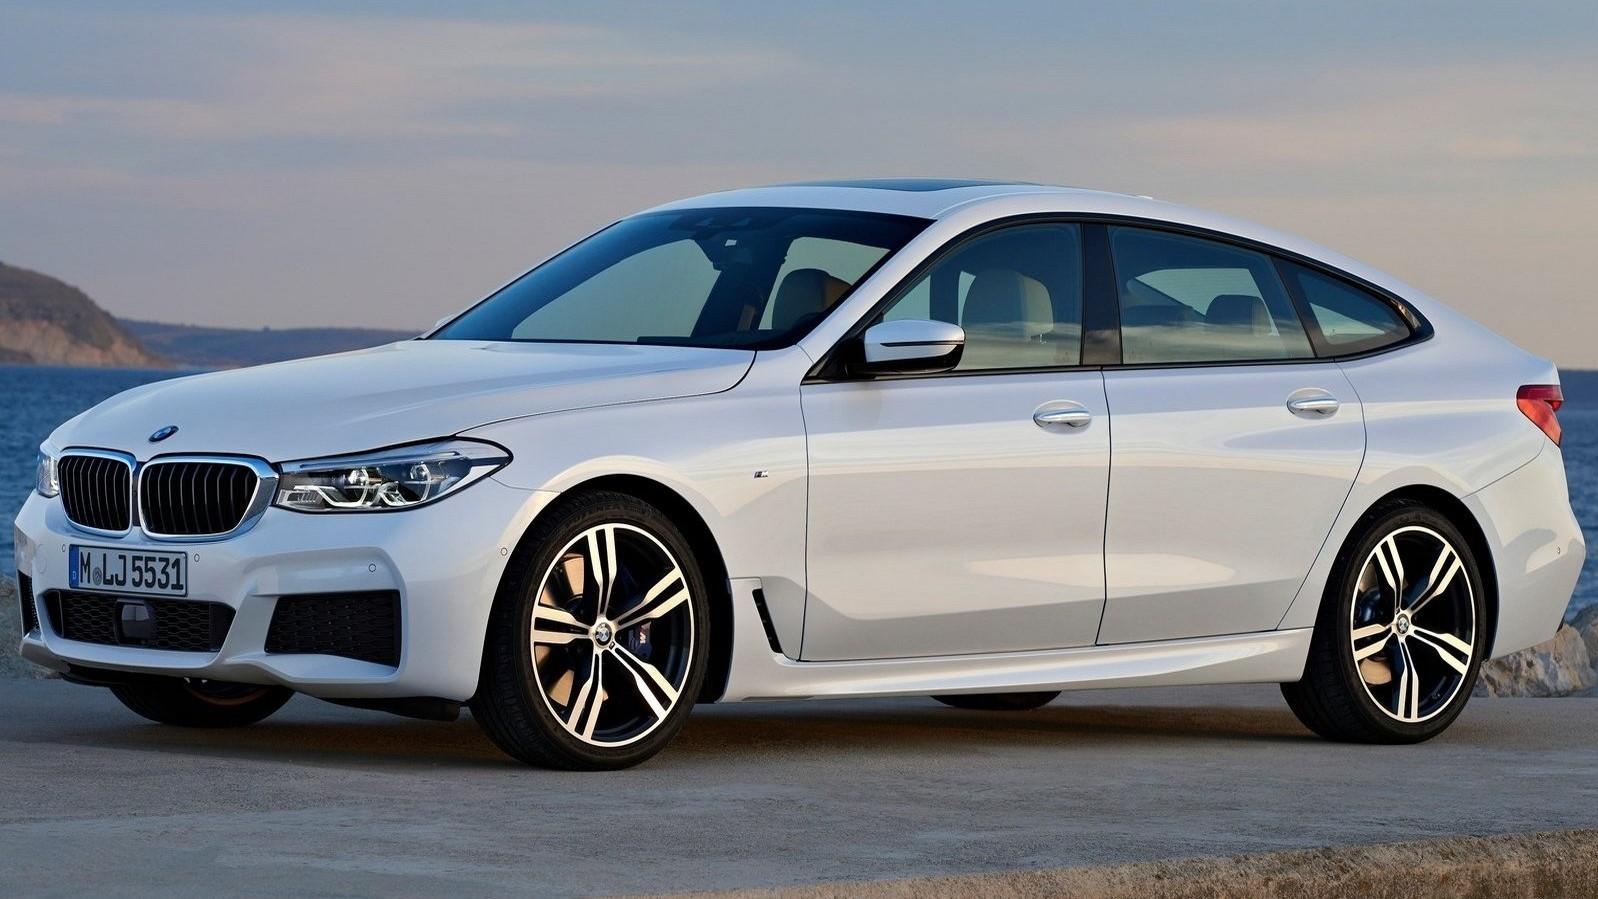 BMW 6 Series Gran Turismo 2018